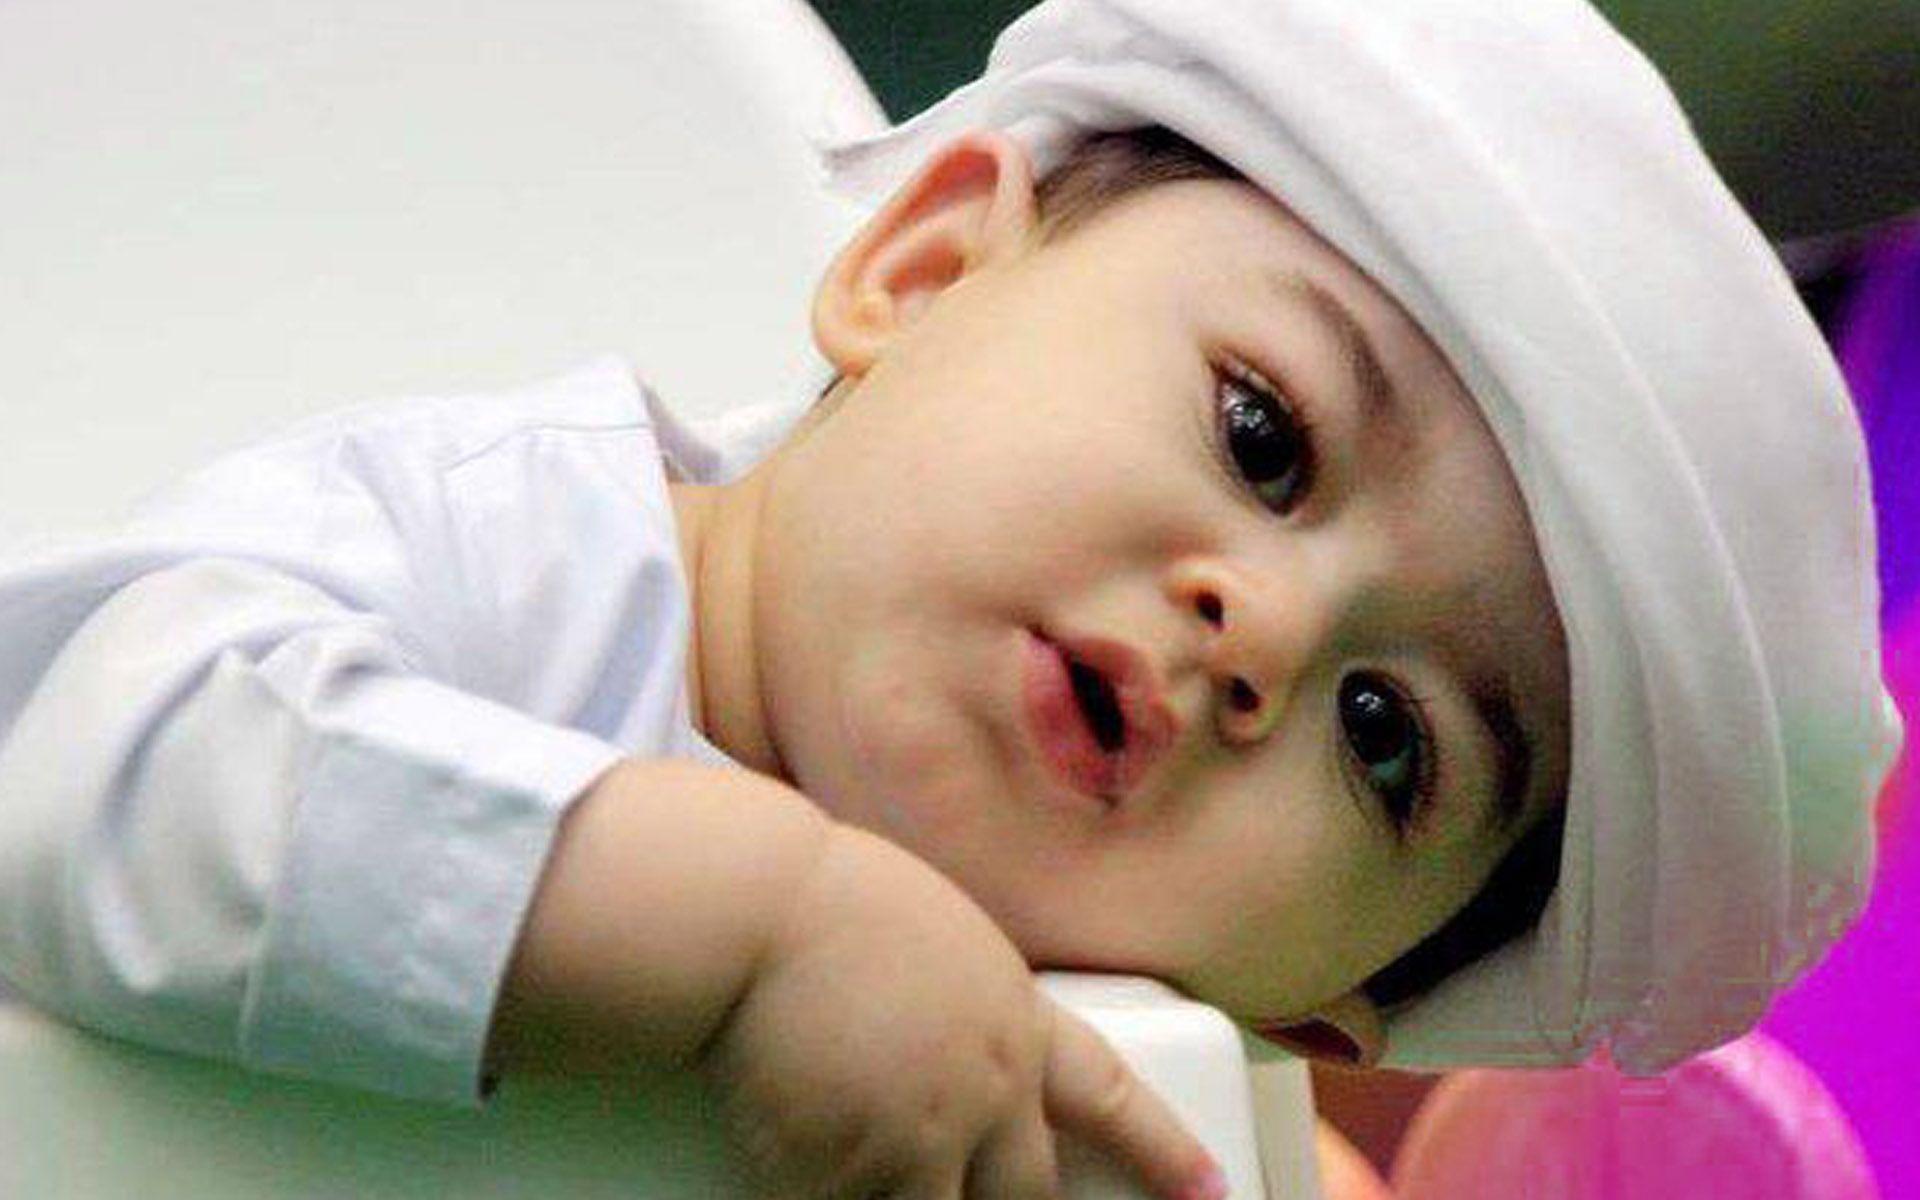 221231837b71 Cute Baby Boy HD Wallpapers - Wallpaper Cave